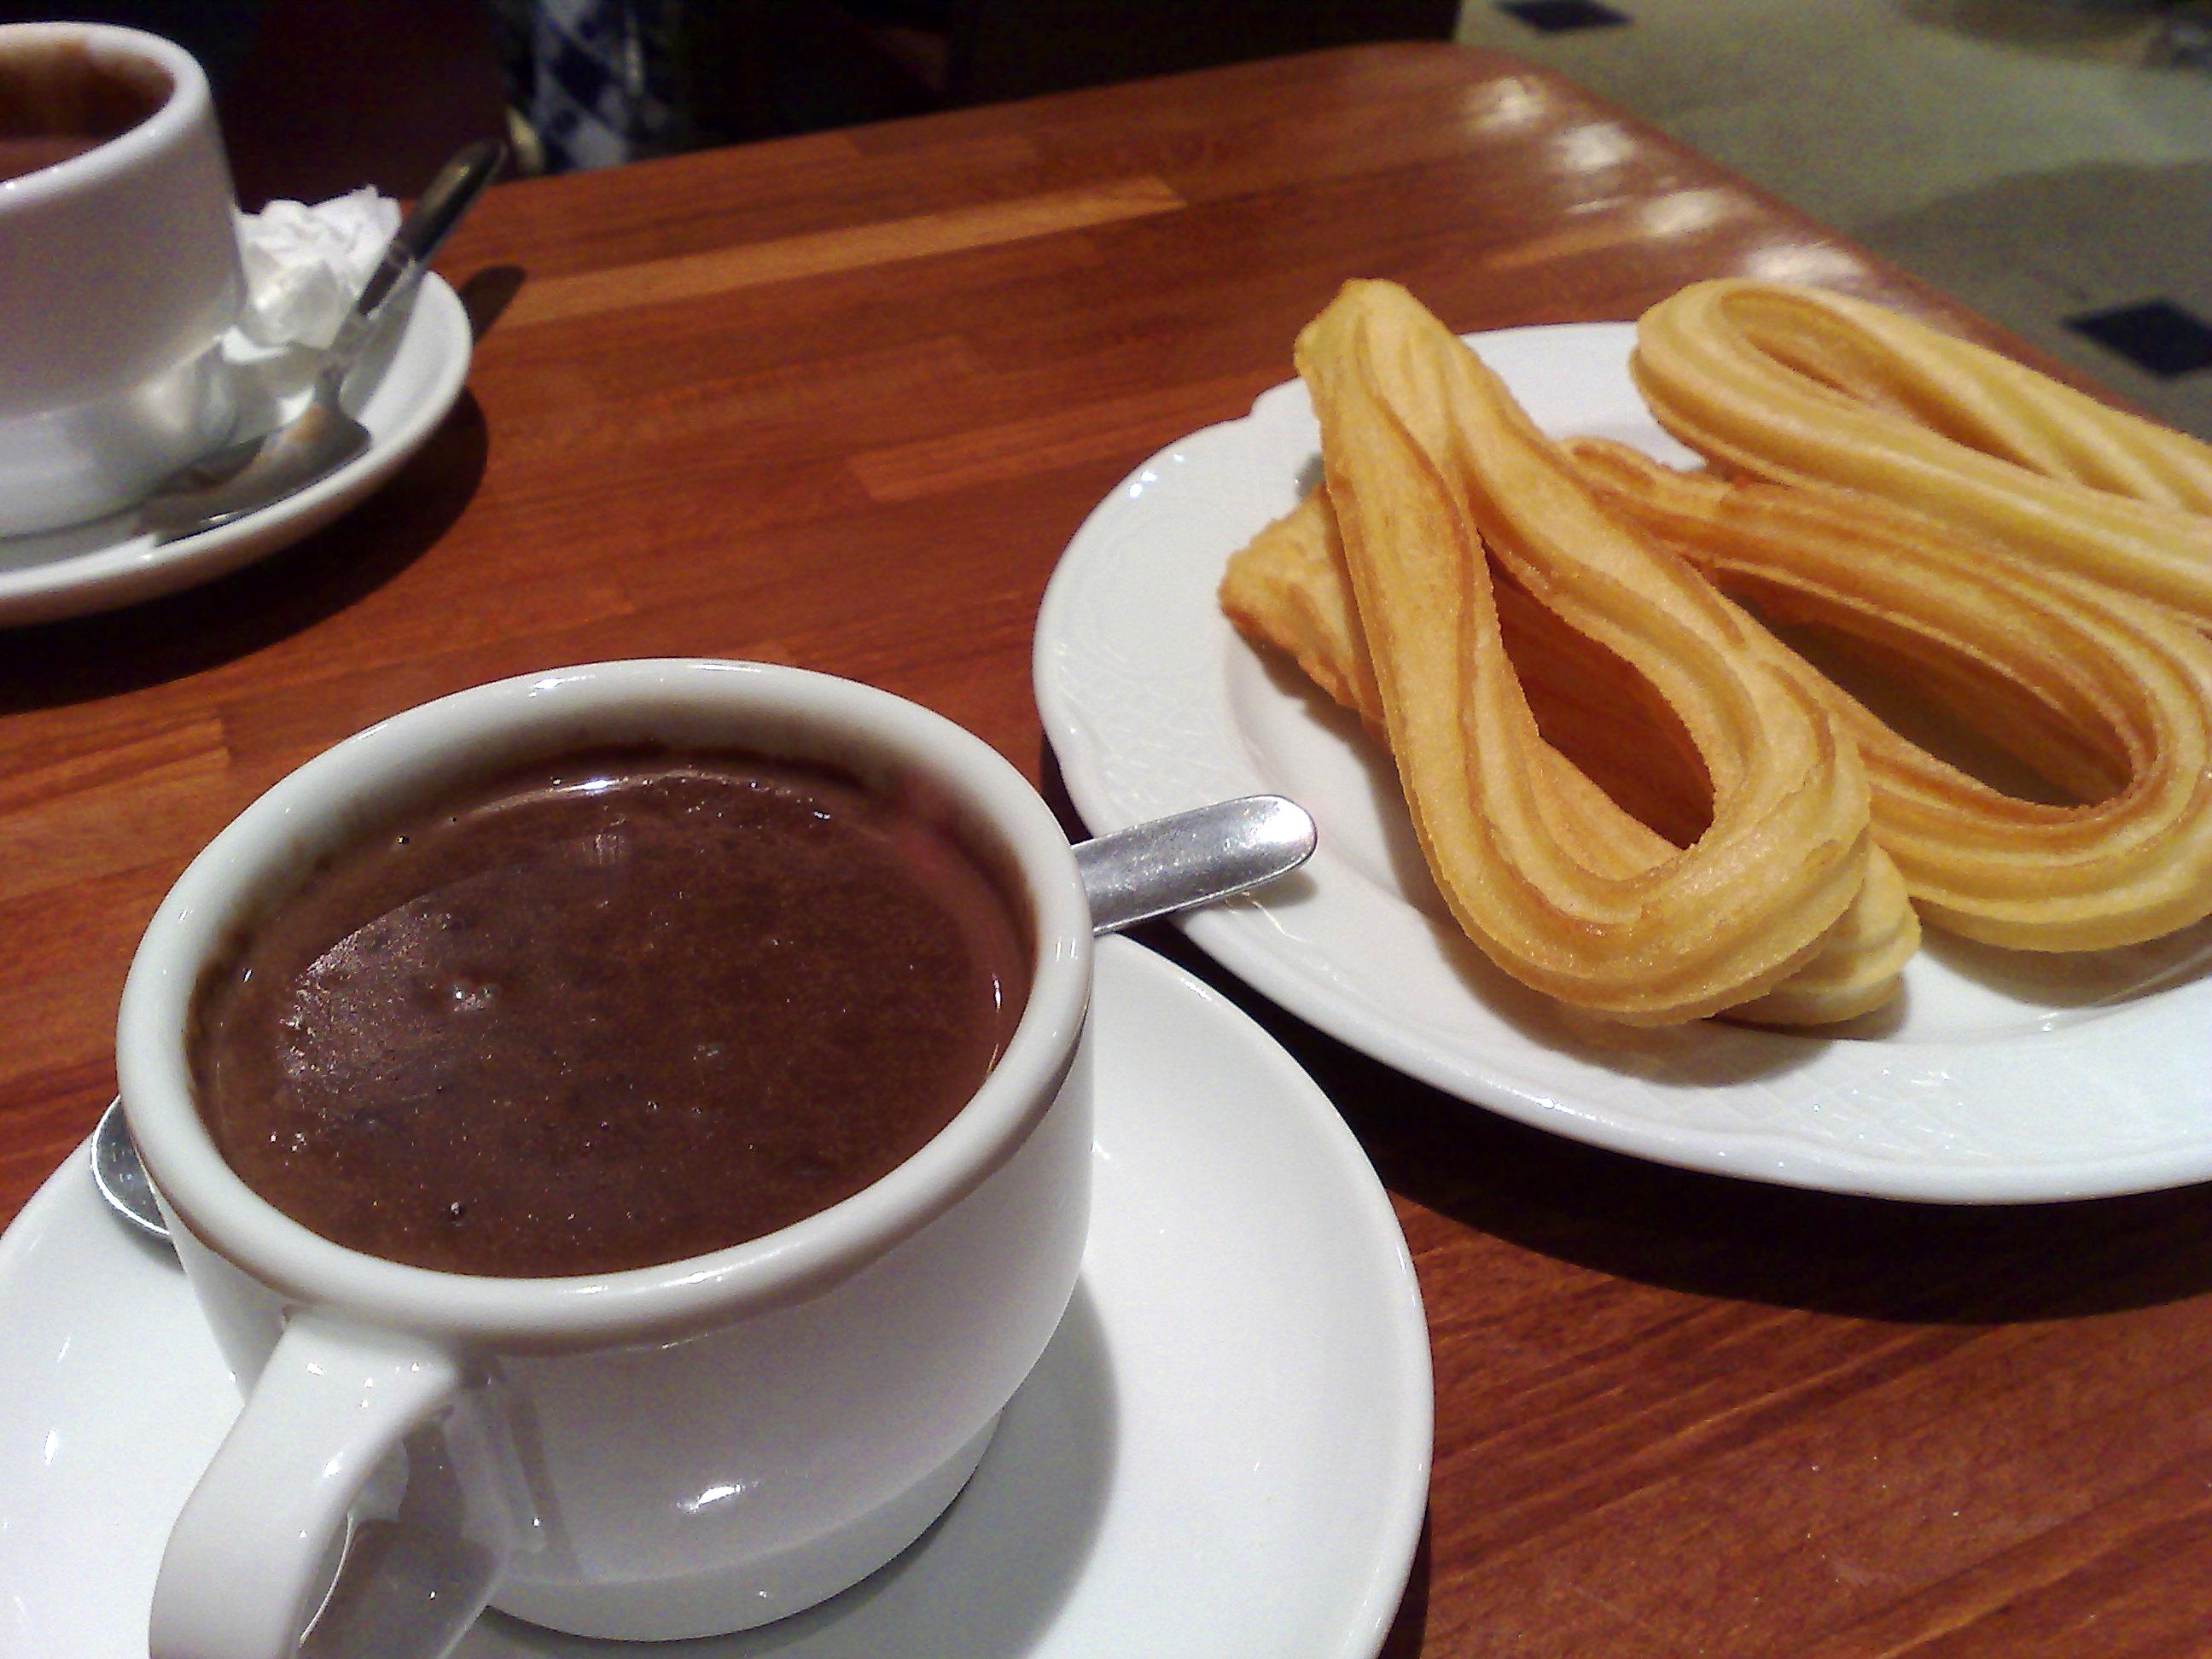 File:Chocolate con churros en Barcelona.jpg - Wikimedia Commons